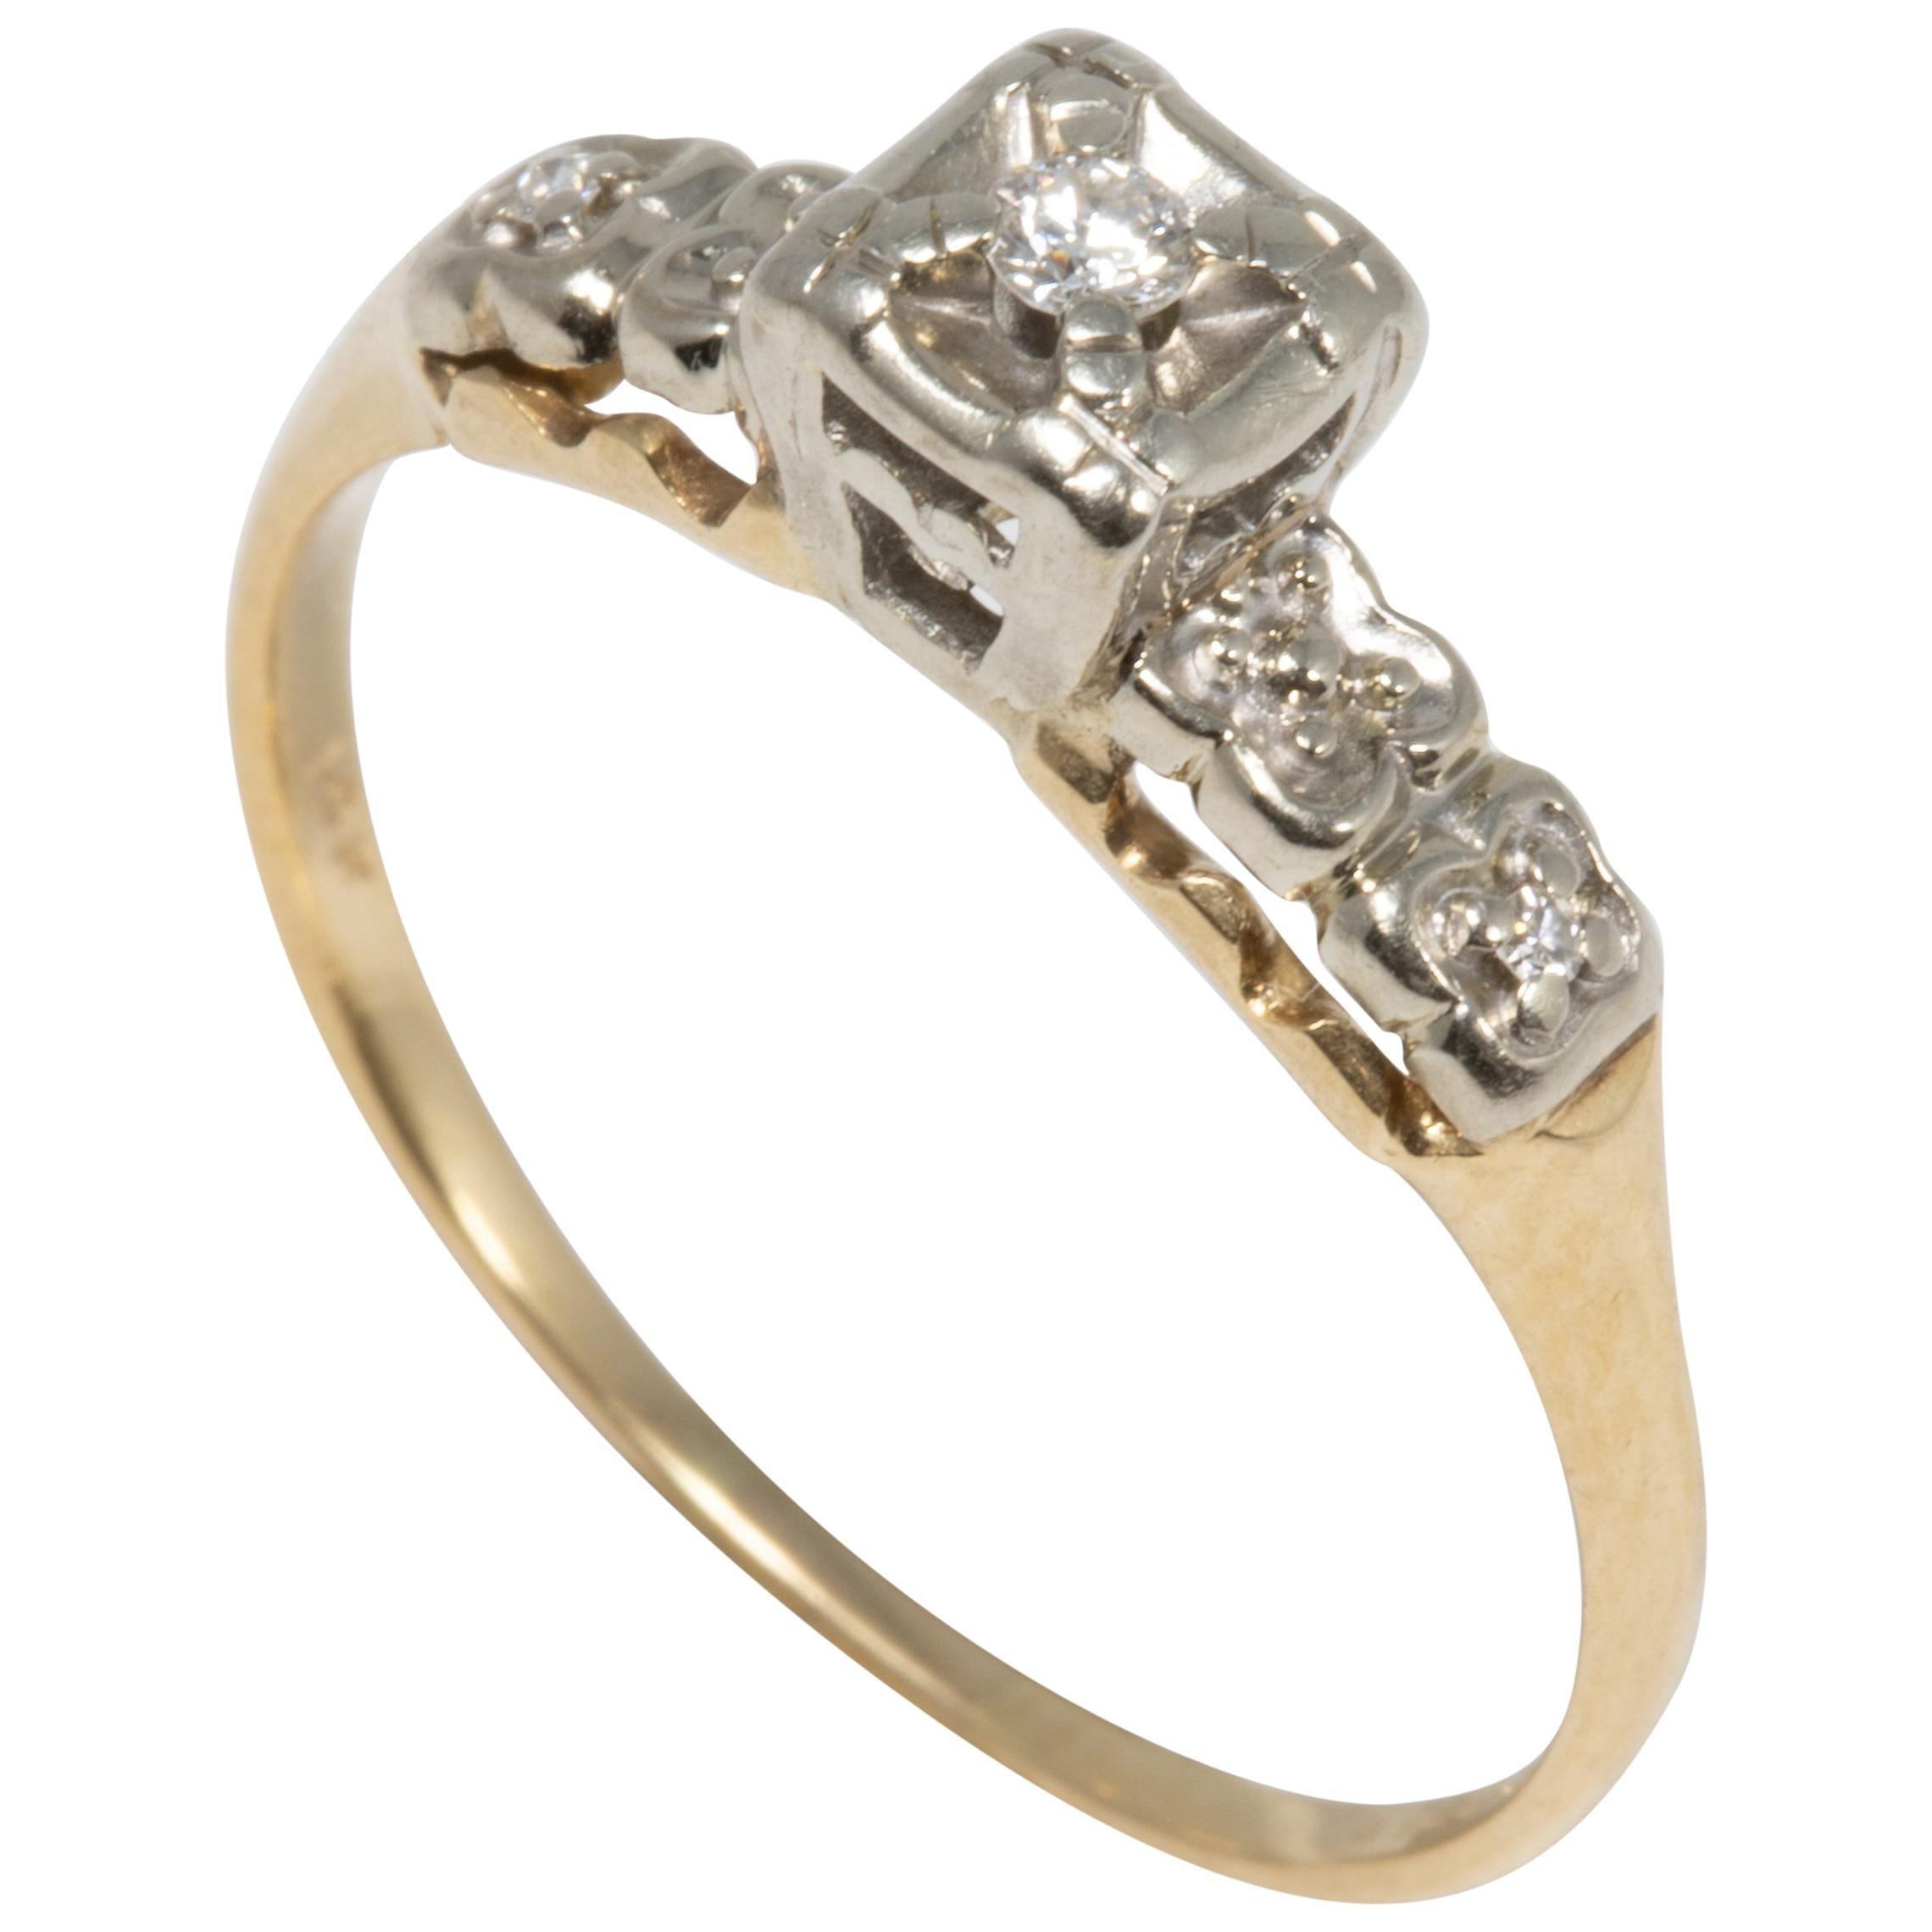 Jewelry & Watches 14k Yellow Hallmarked Gold 0.23ct Certified Diamond Cluster Ring Jewelry Fine Jewelry